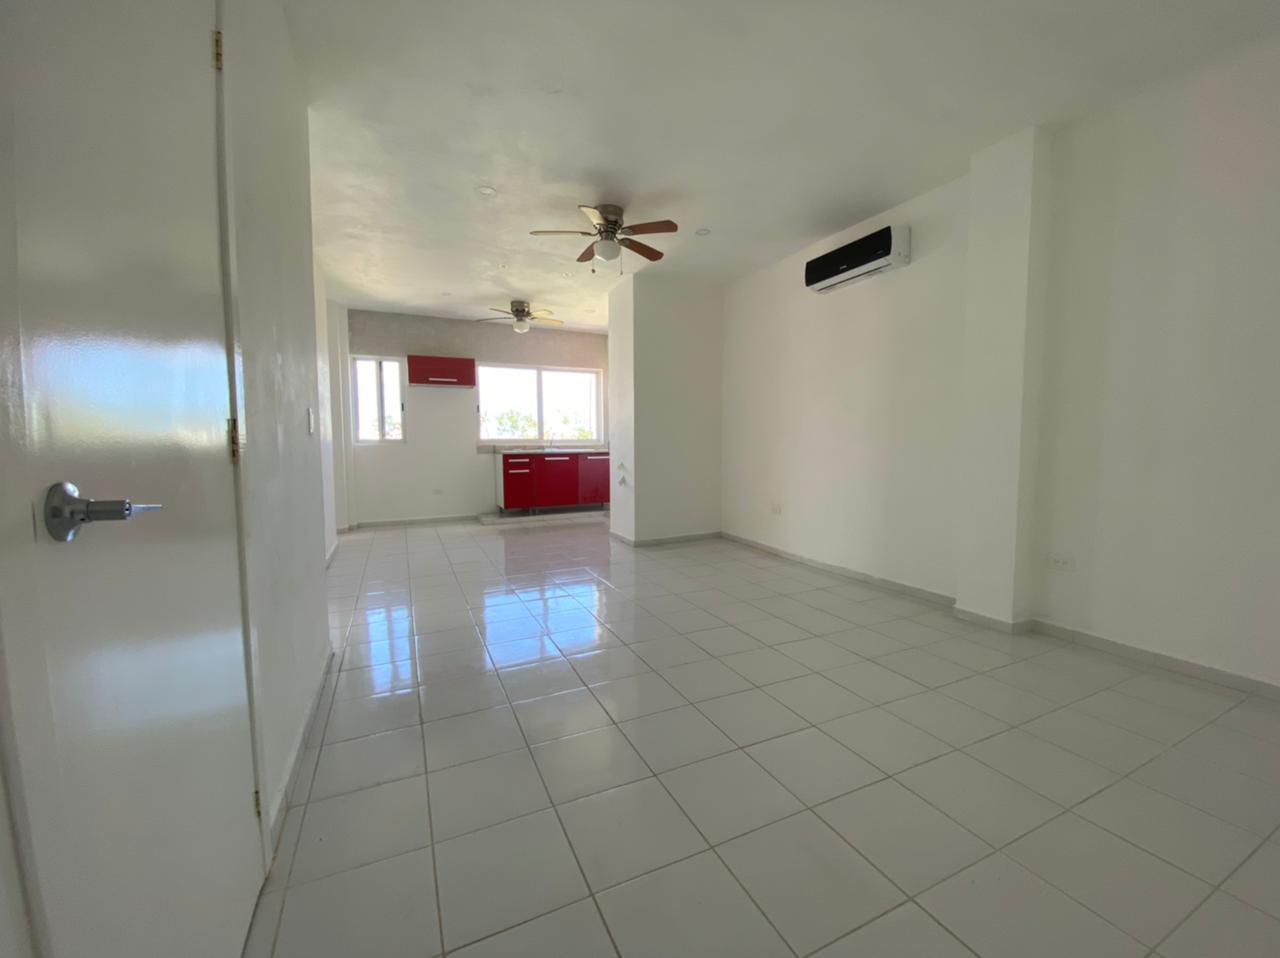 Departamento Renta Cancun Av Huayacan